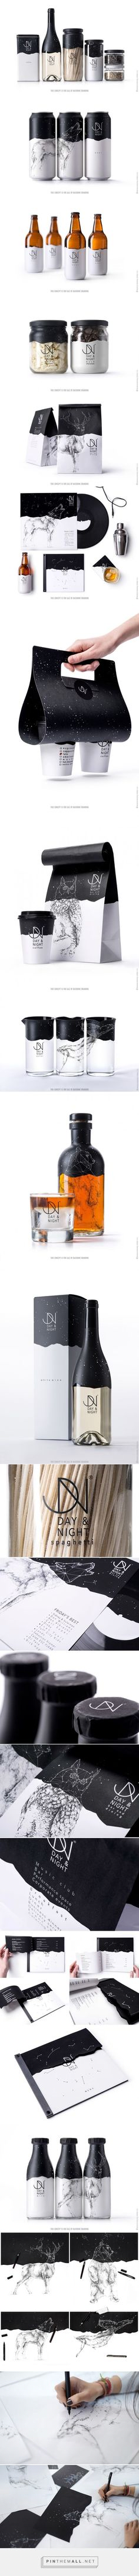 Day & Night packaging designed by Backbone Branding (Armenia) - http://www.packagingoftheworld.com/2016/03/day-night.html: Corporate Identity Design, Branding Design, Design Typography, Label Design, Brand Identity, Lettering, Branding Ideas, Design Agency, Product Packaging Design